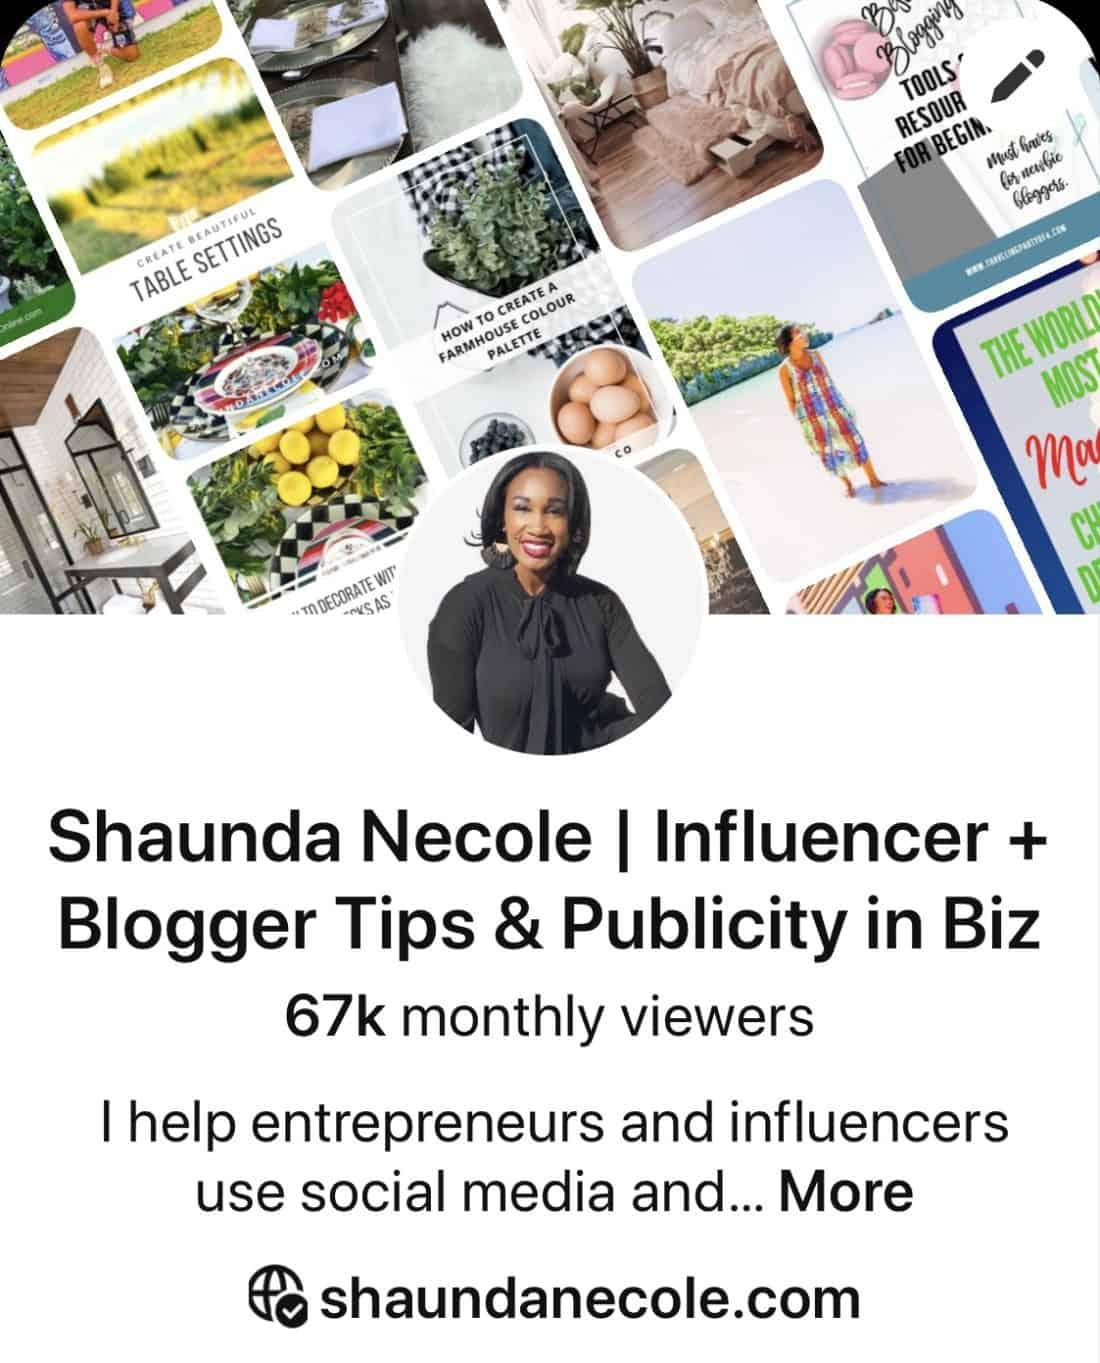 Pinterest Shaunda Necole Blog- How to Grow Your Blog Traffic With Pinterest